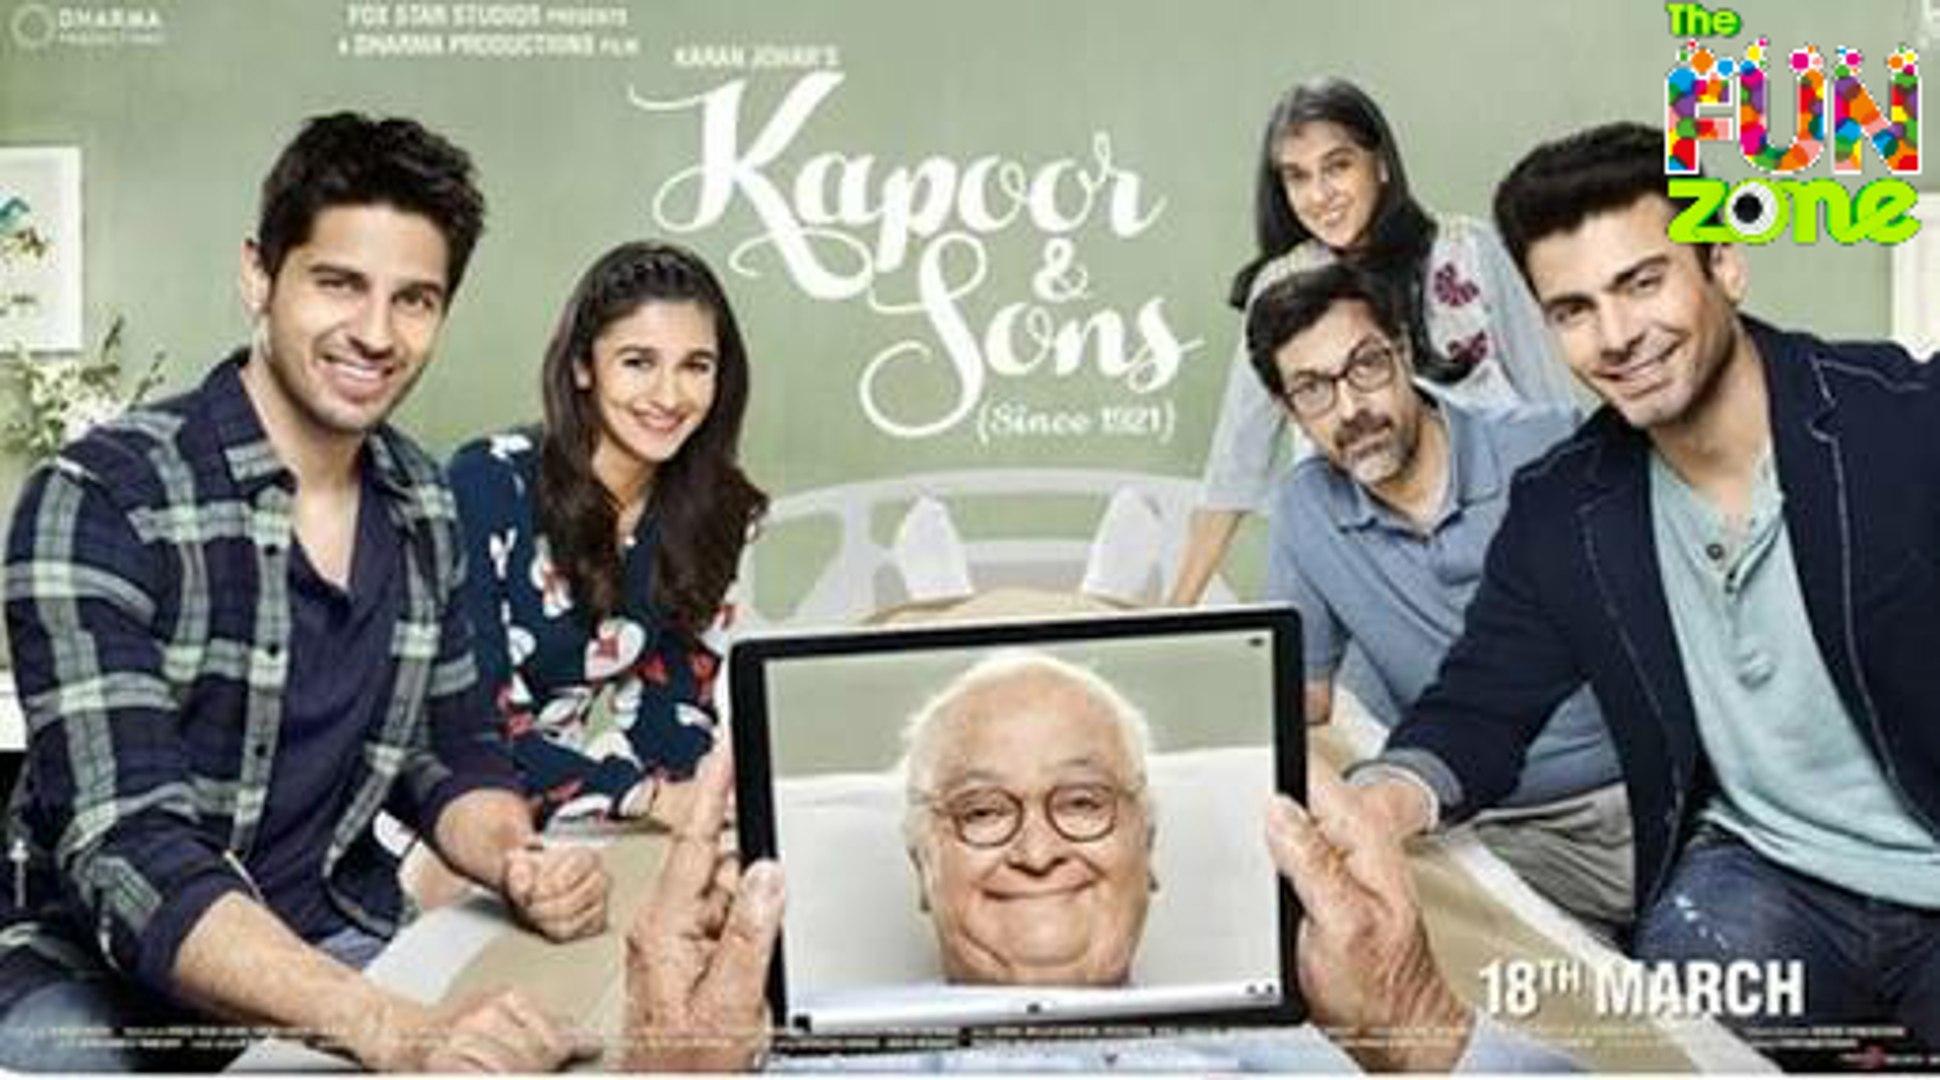 Movie Kapoor & Sons(2016) - Siddharth Kapoor - Alia Bhatt - Mithibai College Full Movie Promotio